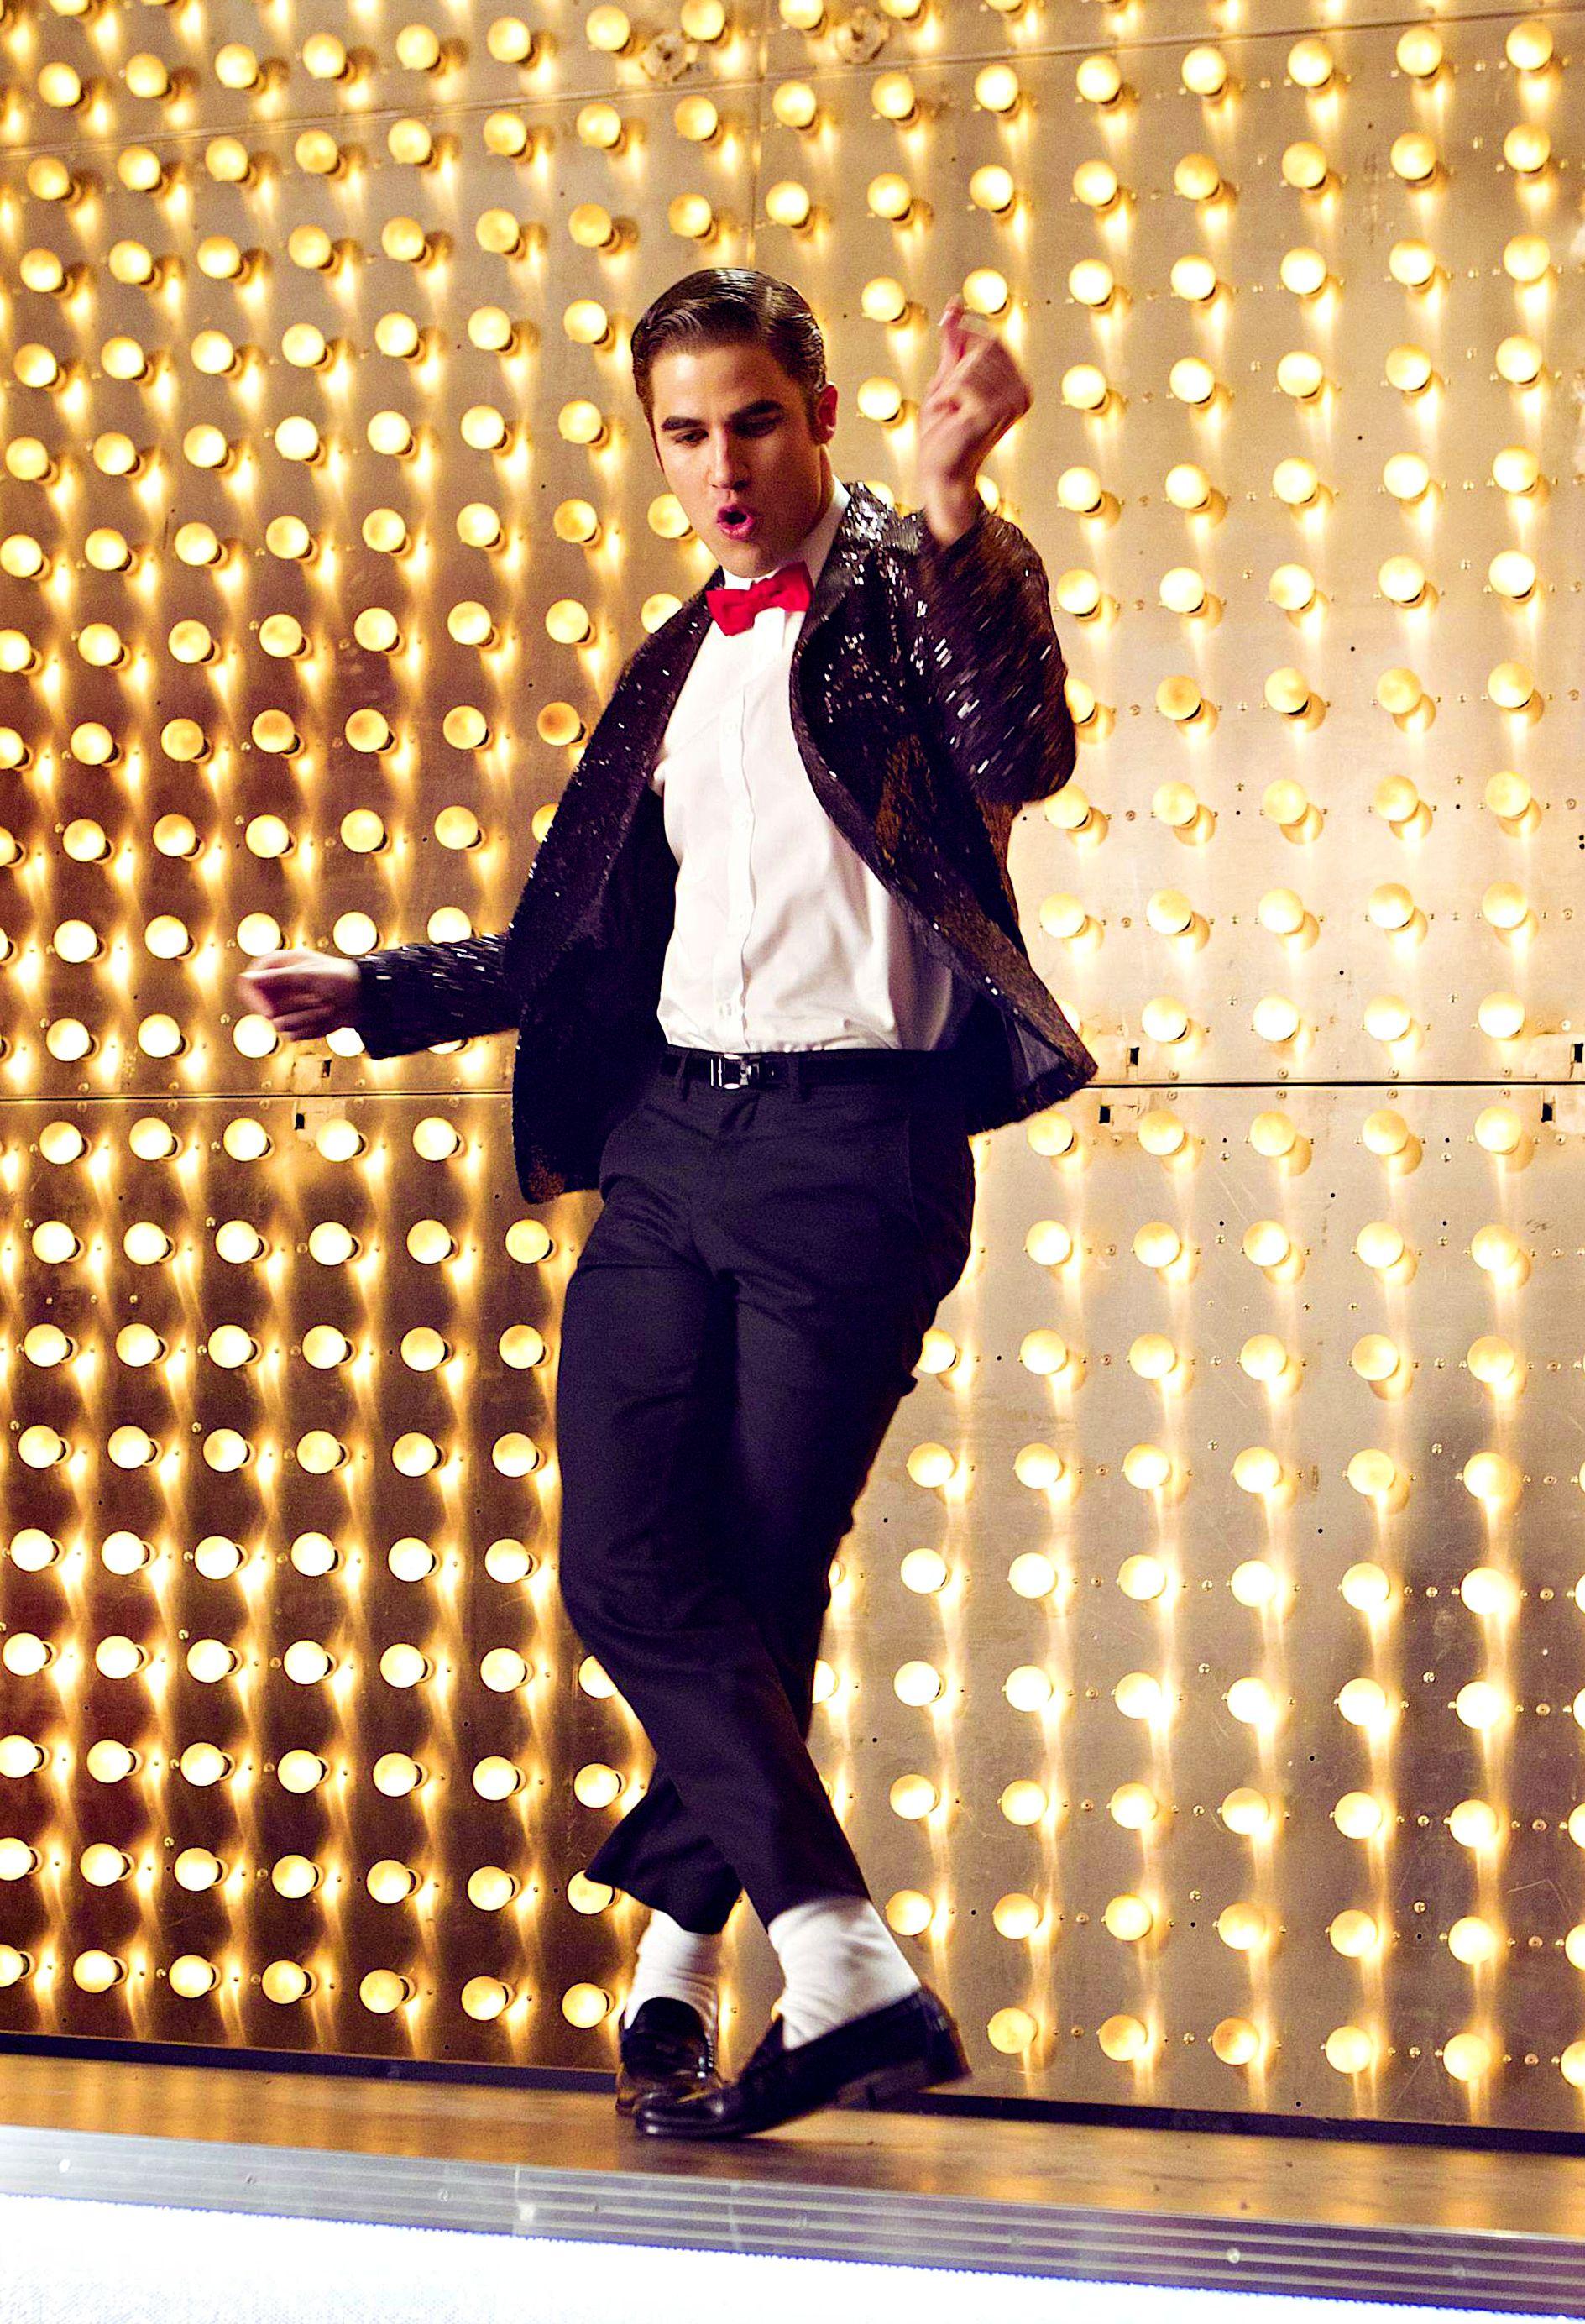 Blaine Glee Michael Jackson Tribute Episode Still Glee Shows